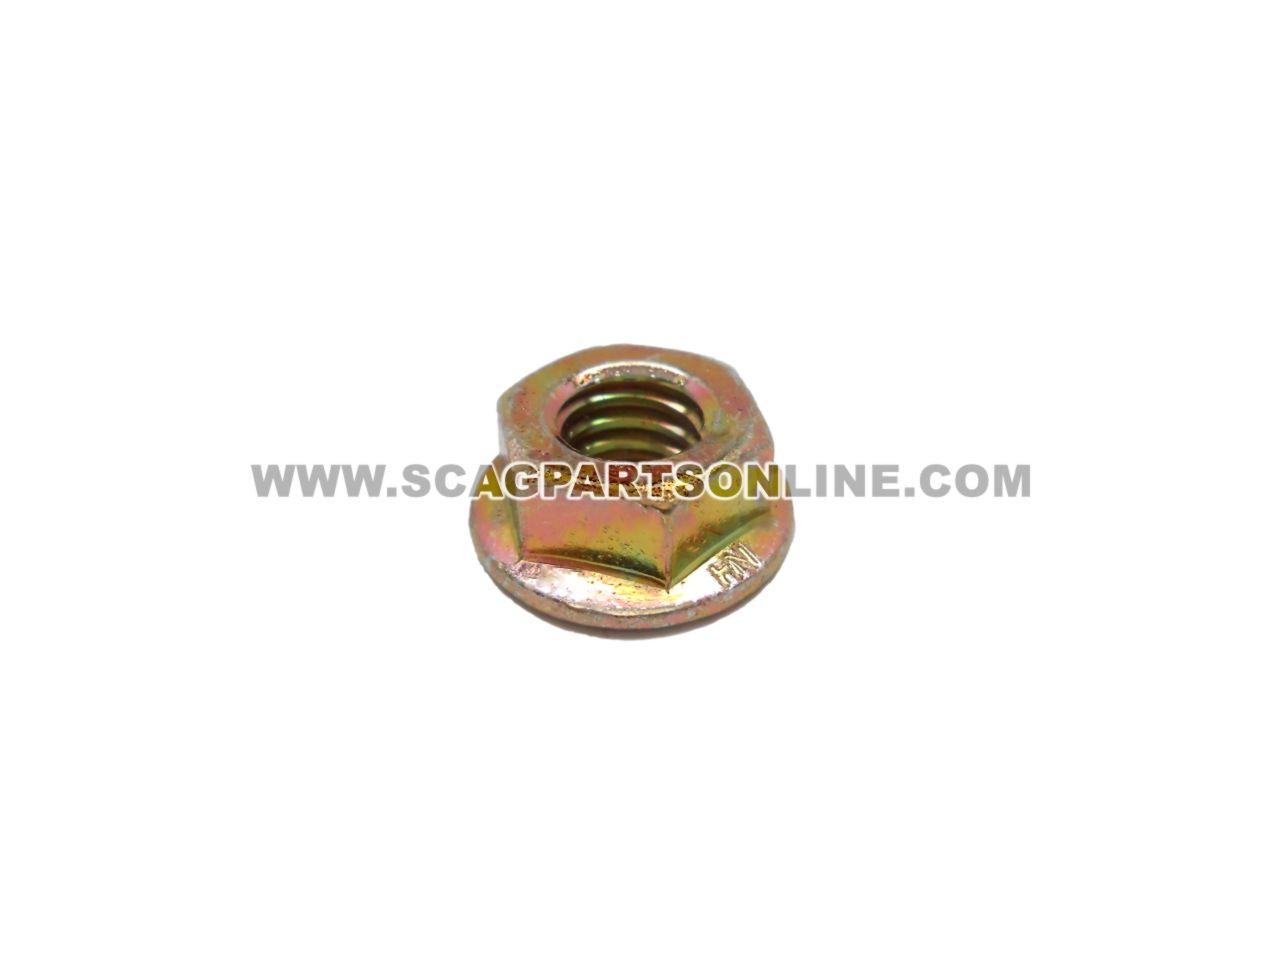 Scag NUT, 5/16-18 SERR FLG HH ZINC 04019-03 - Image 1